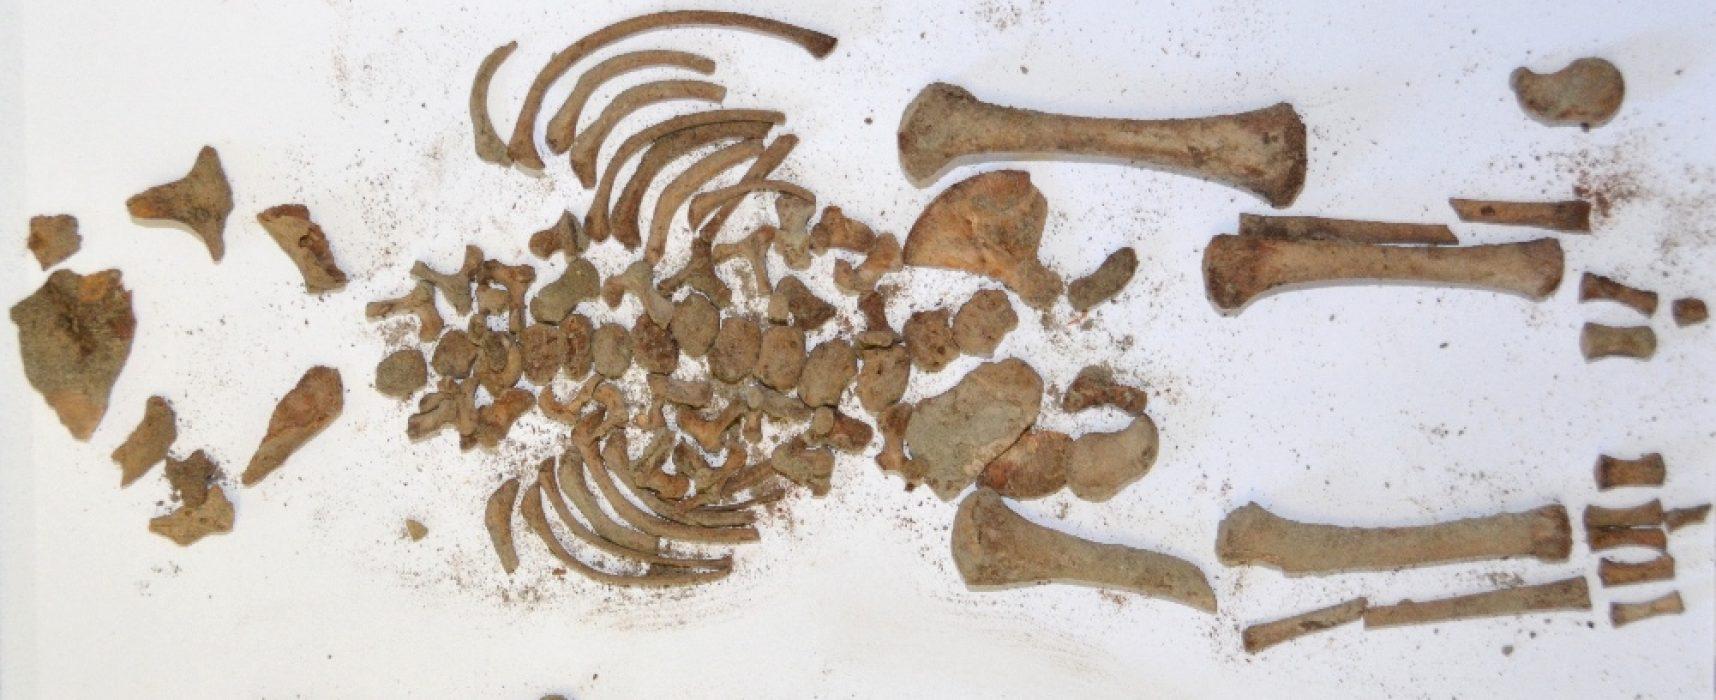 Oplontis, gli scheletri parlanti